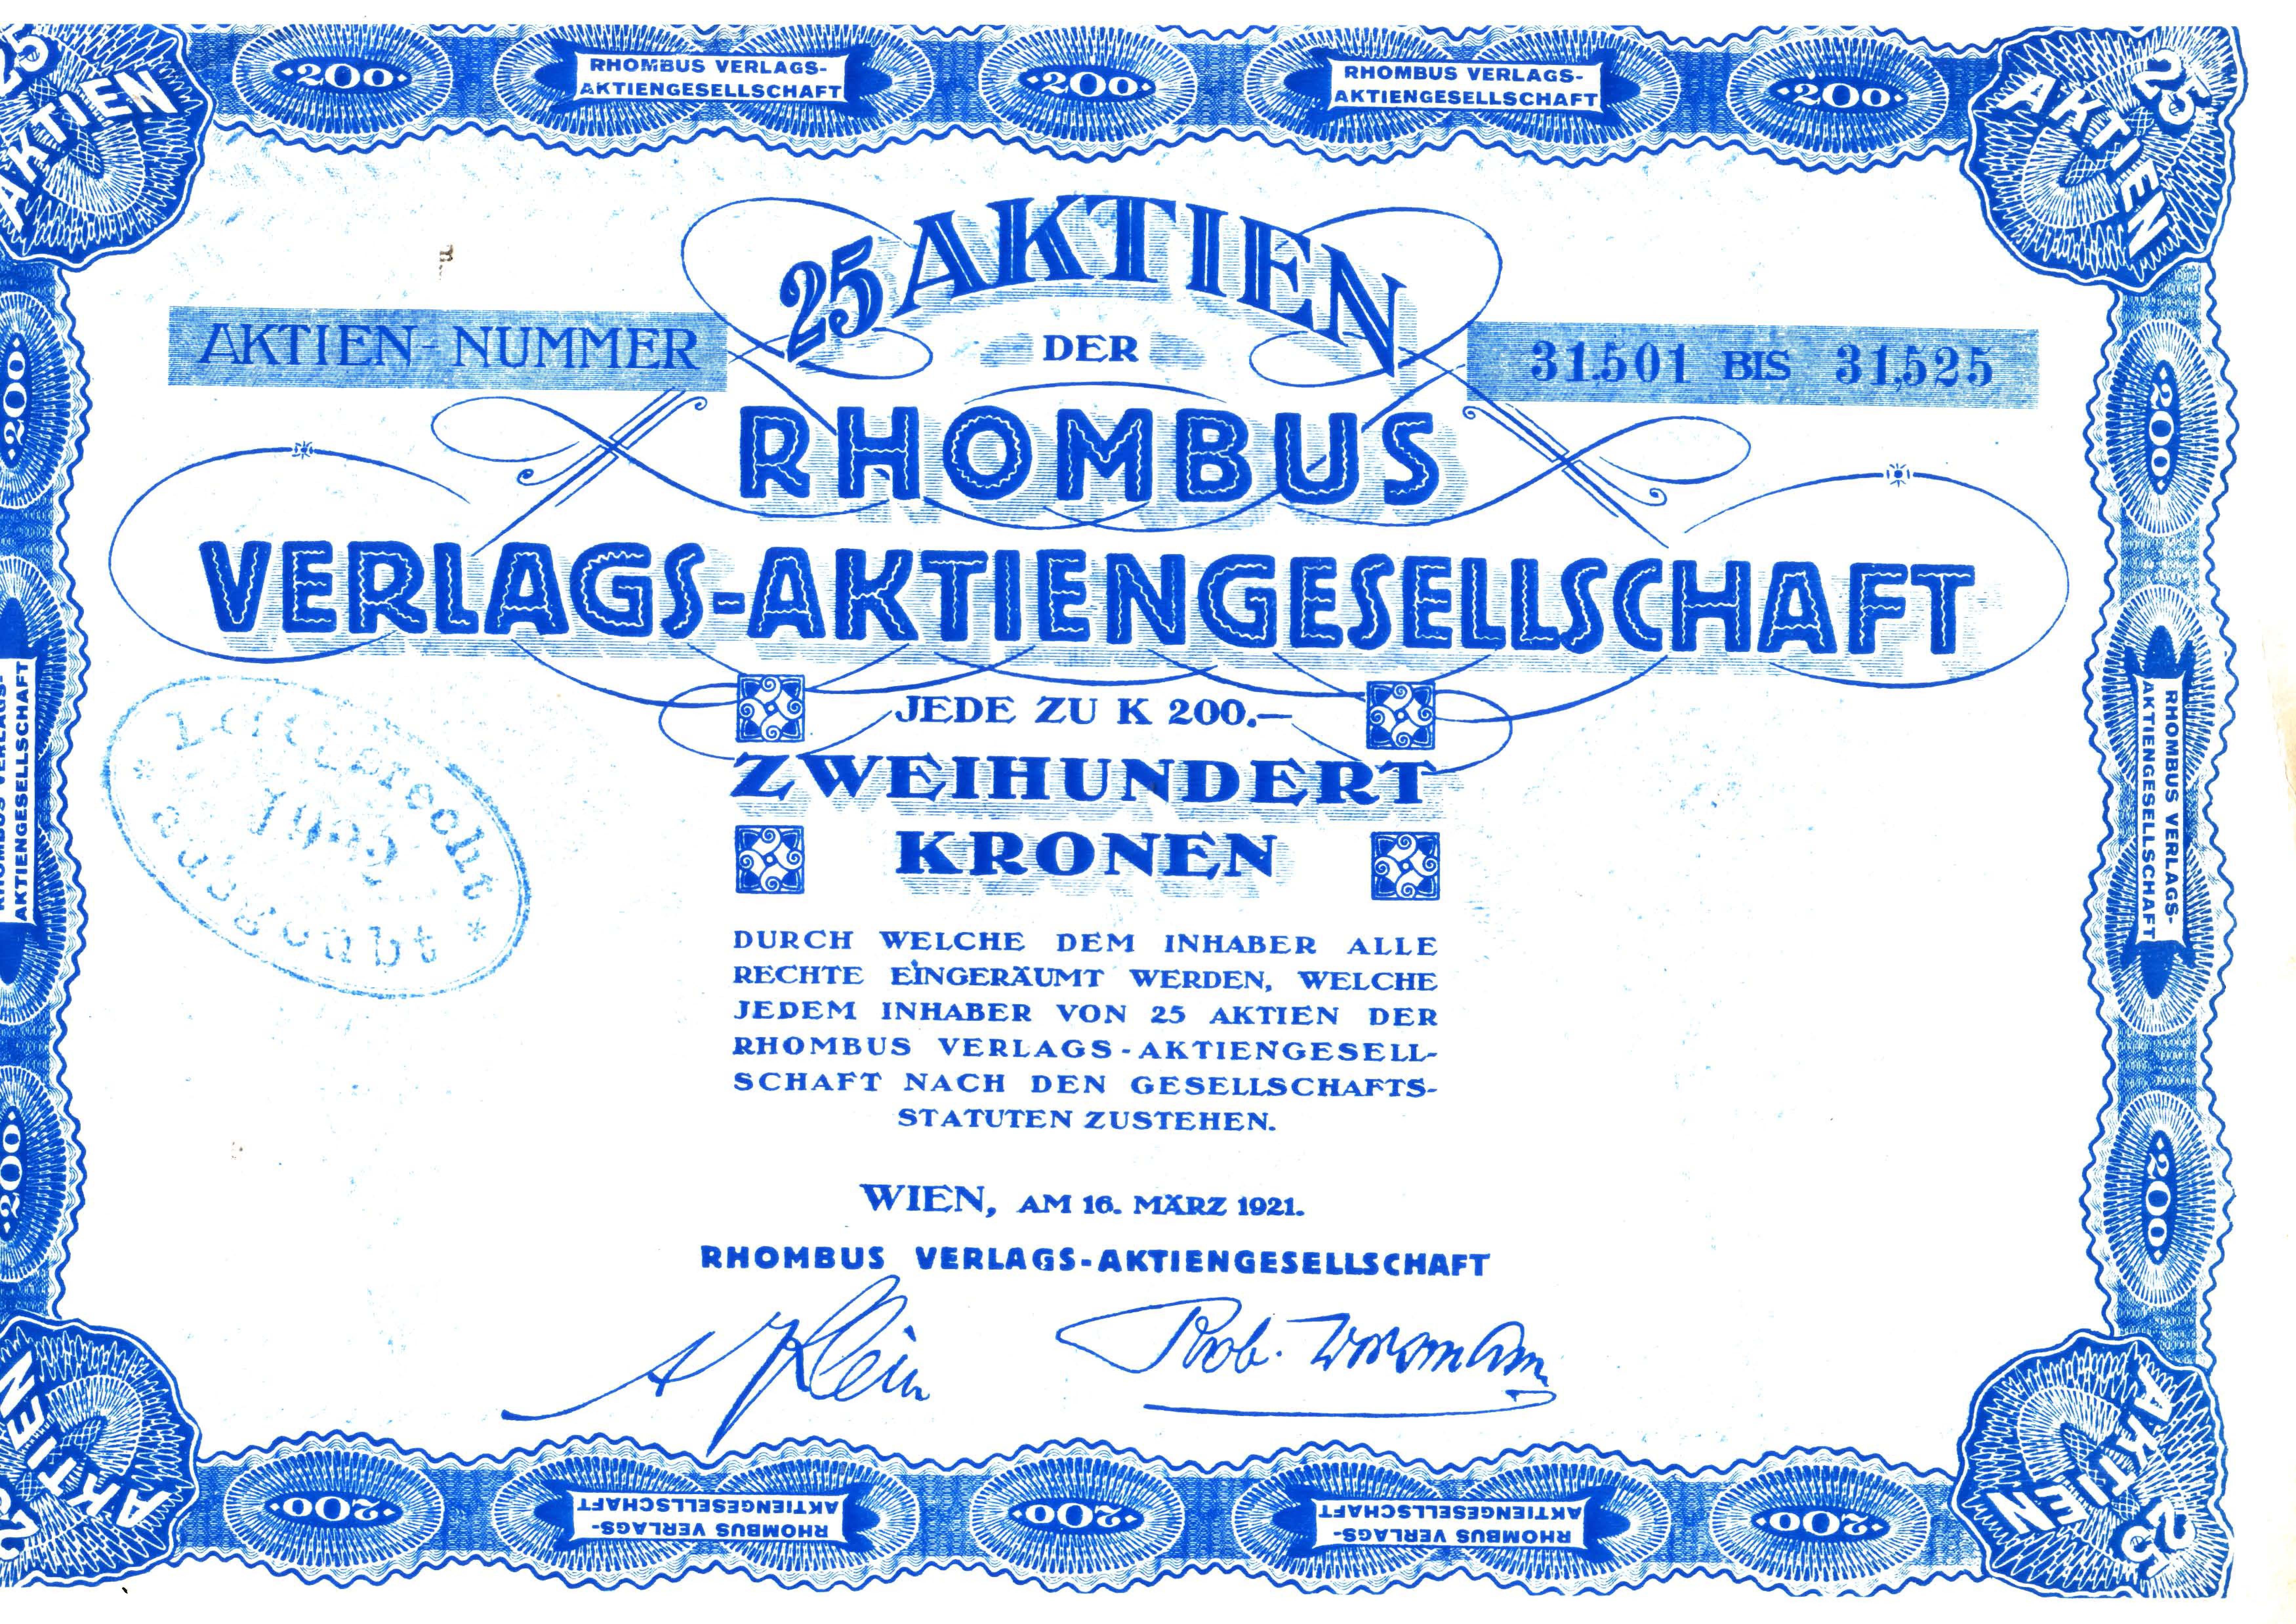 Rhombus Aktie